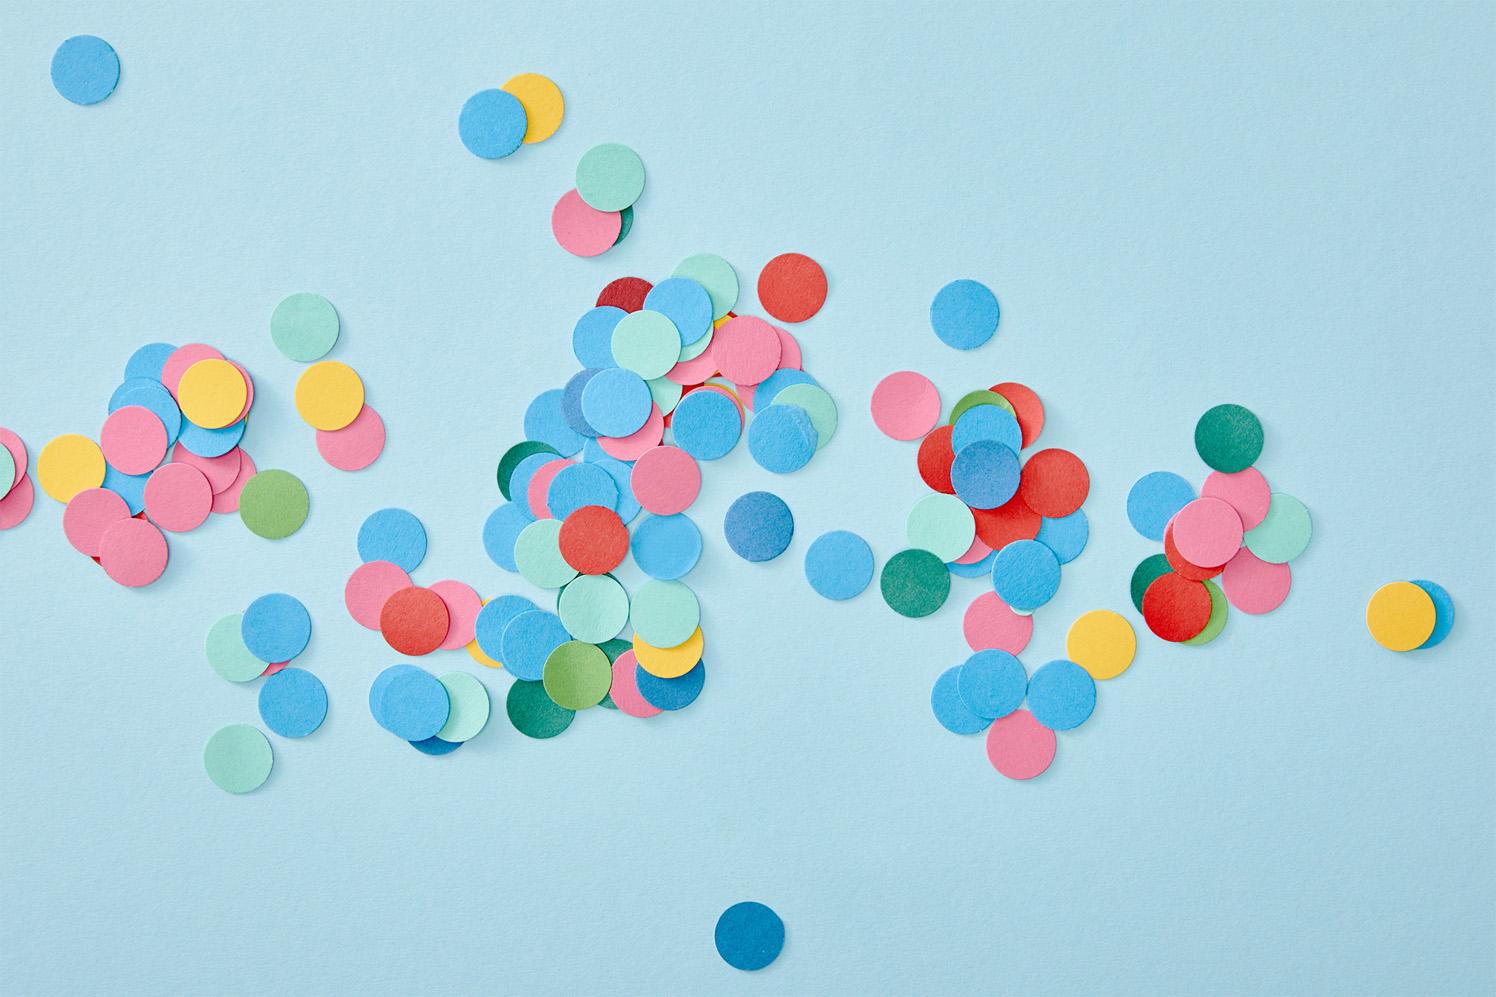 Confetti on a blue background